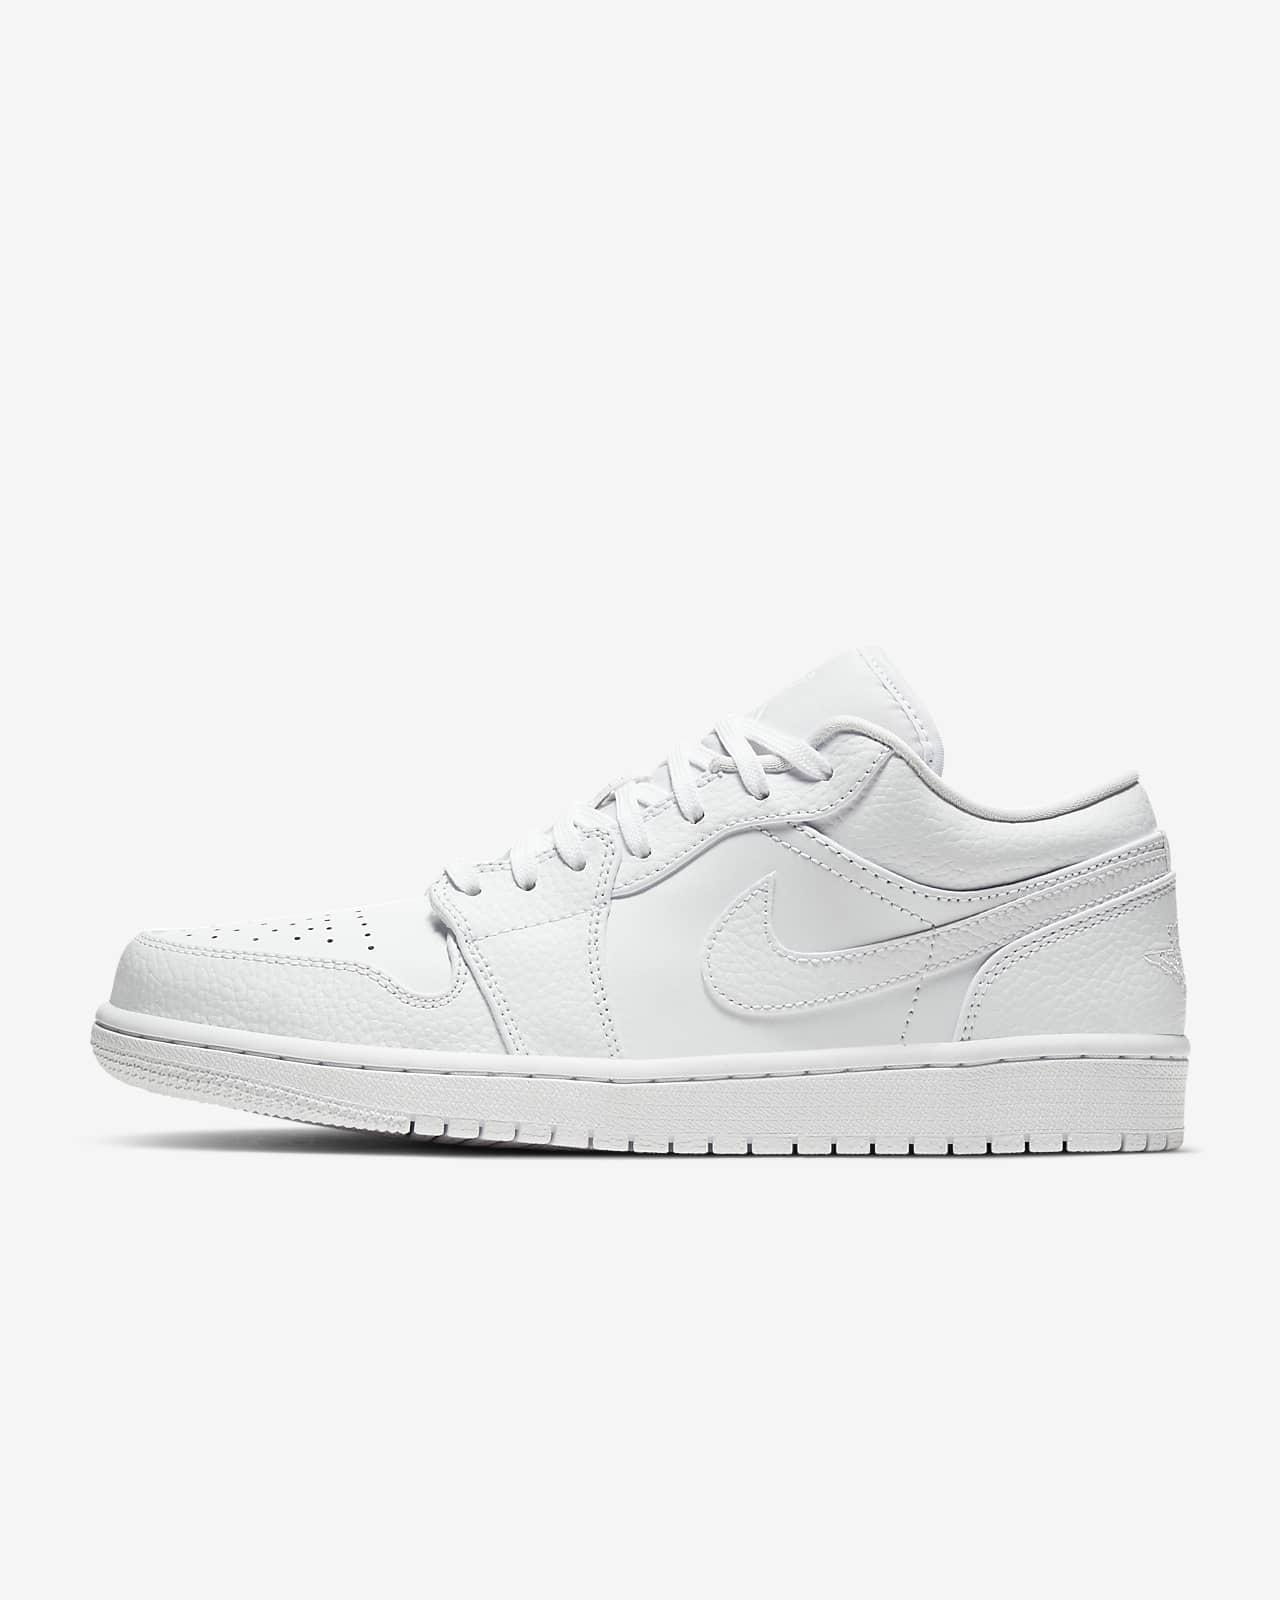 Кроссовки Air Jordan 1 Low. Nike RU